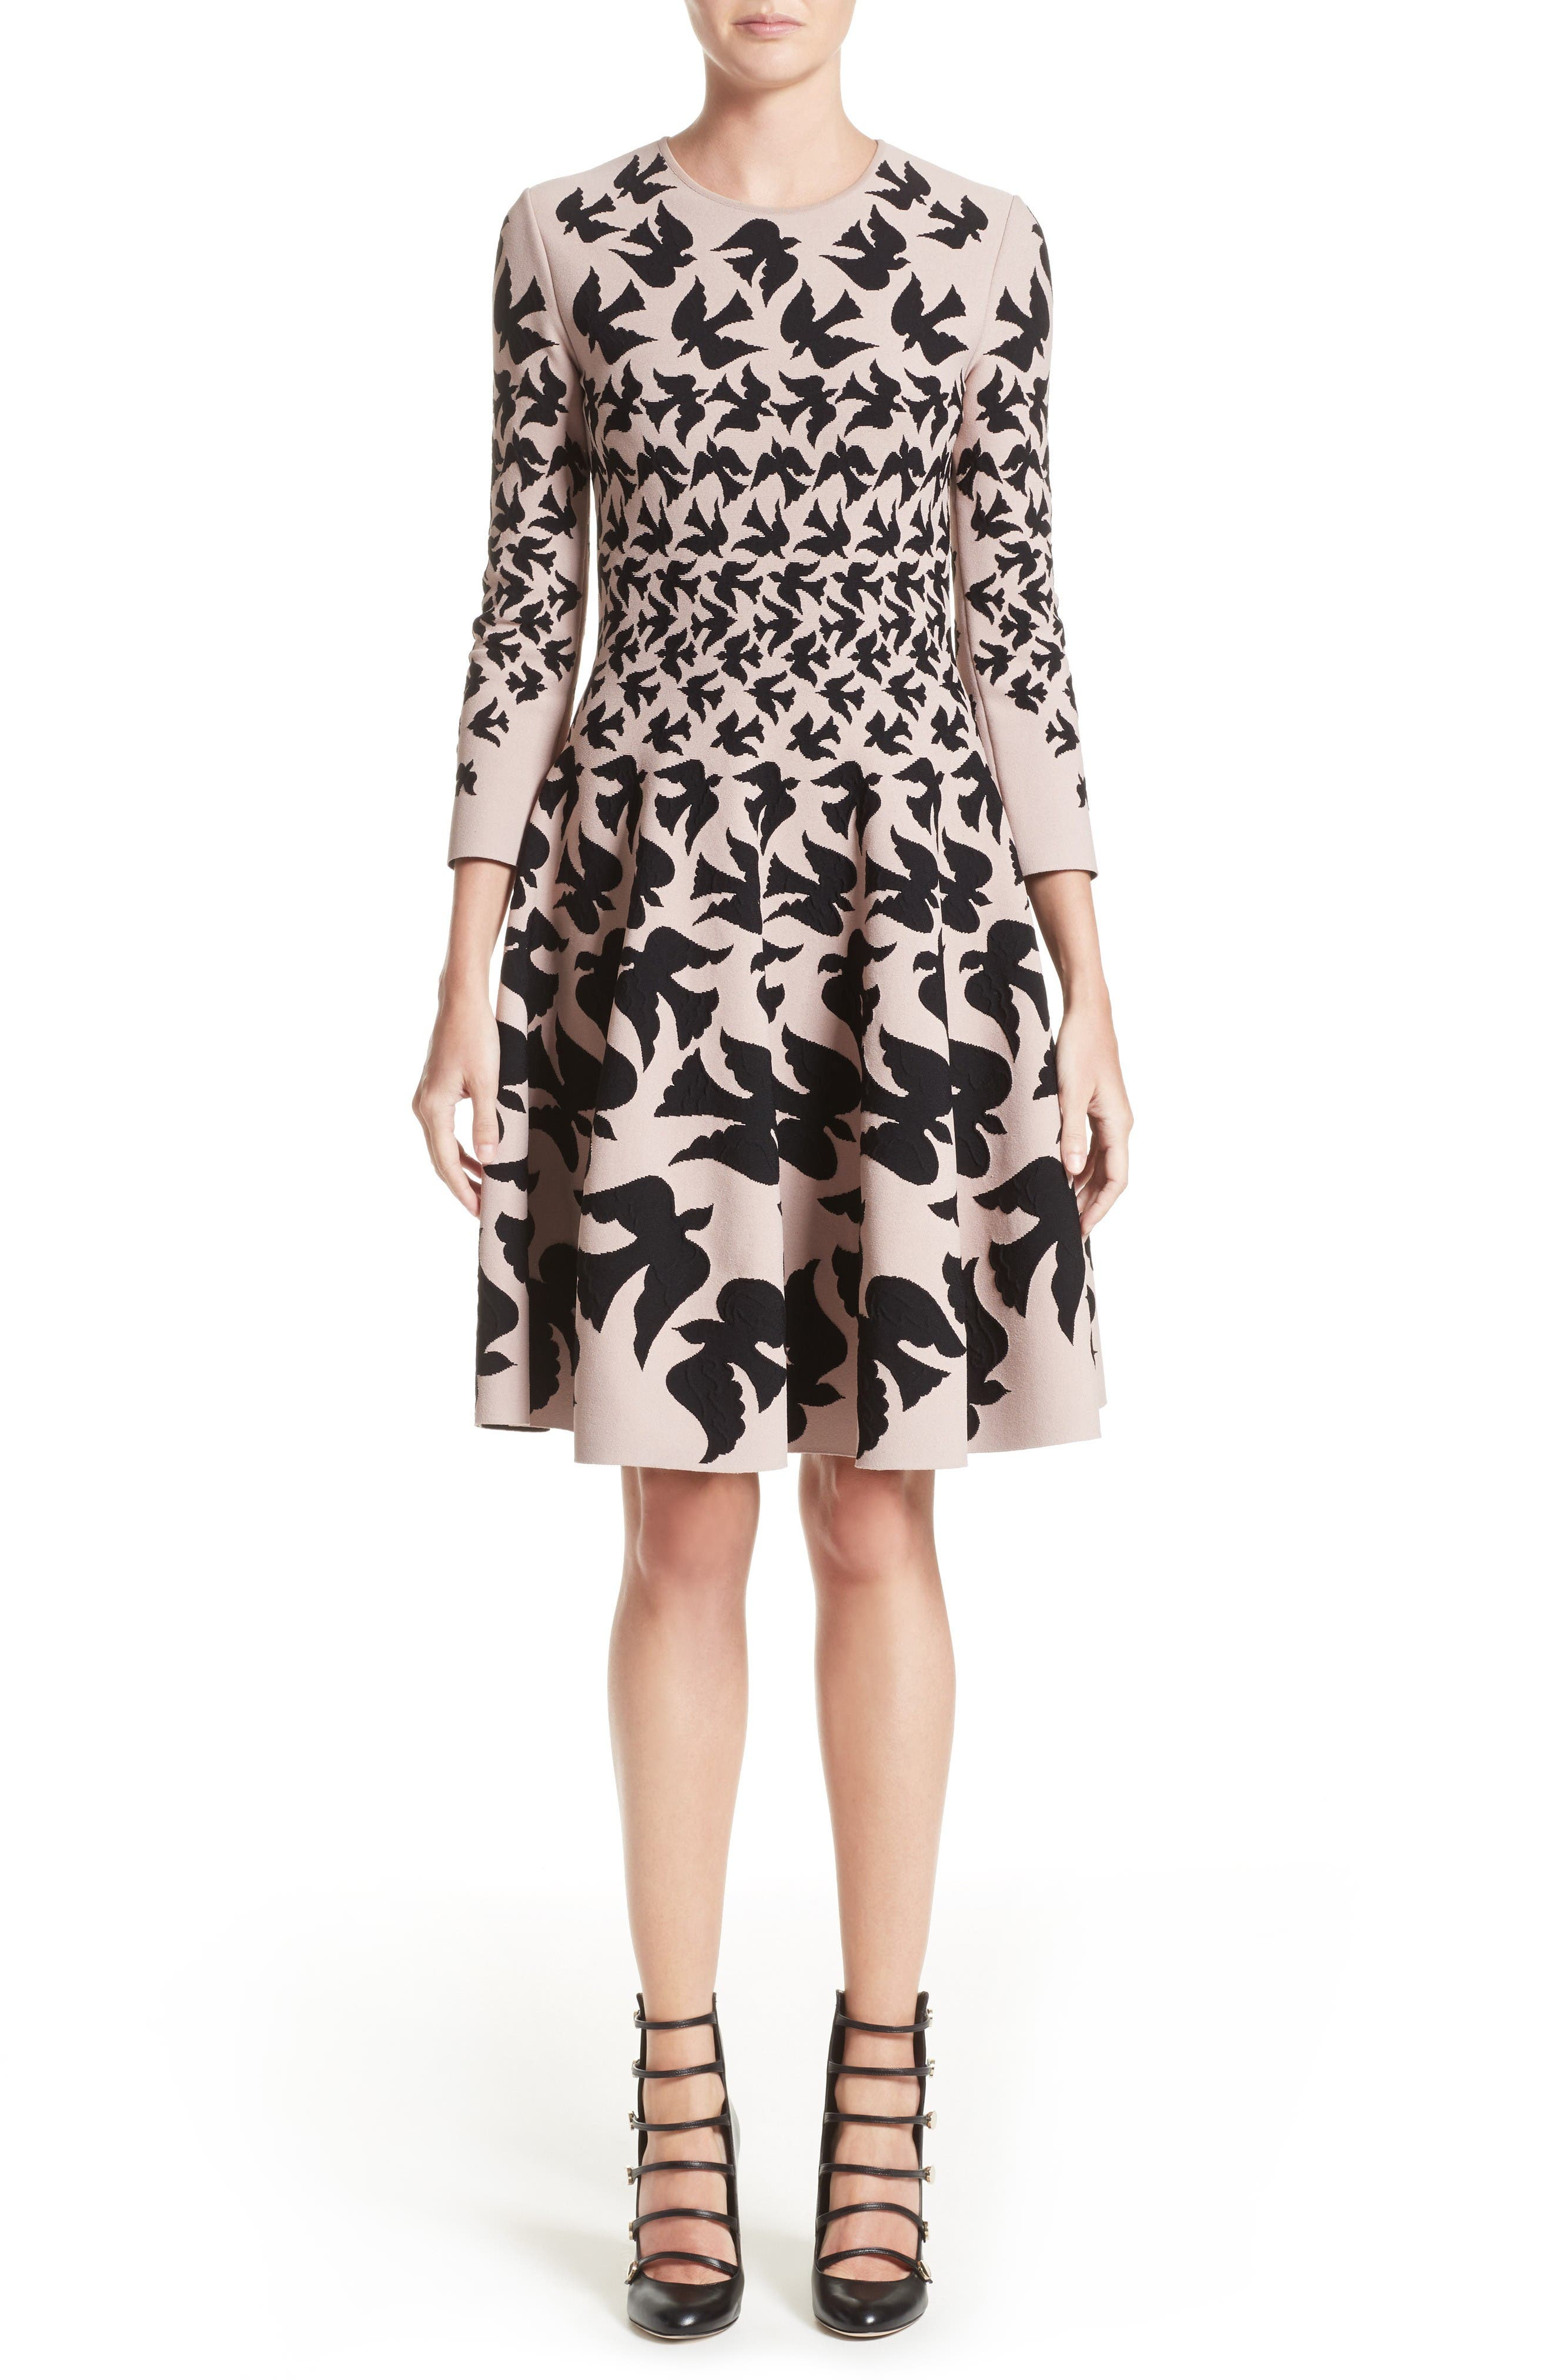 Main Image - Alexander McQueen Swallow Jacquard Dress